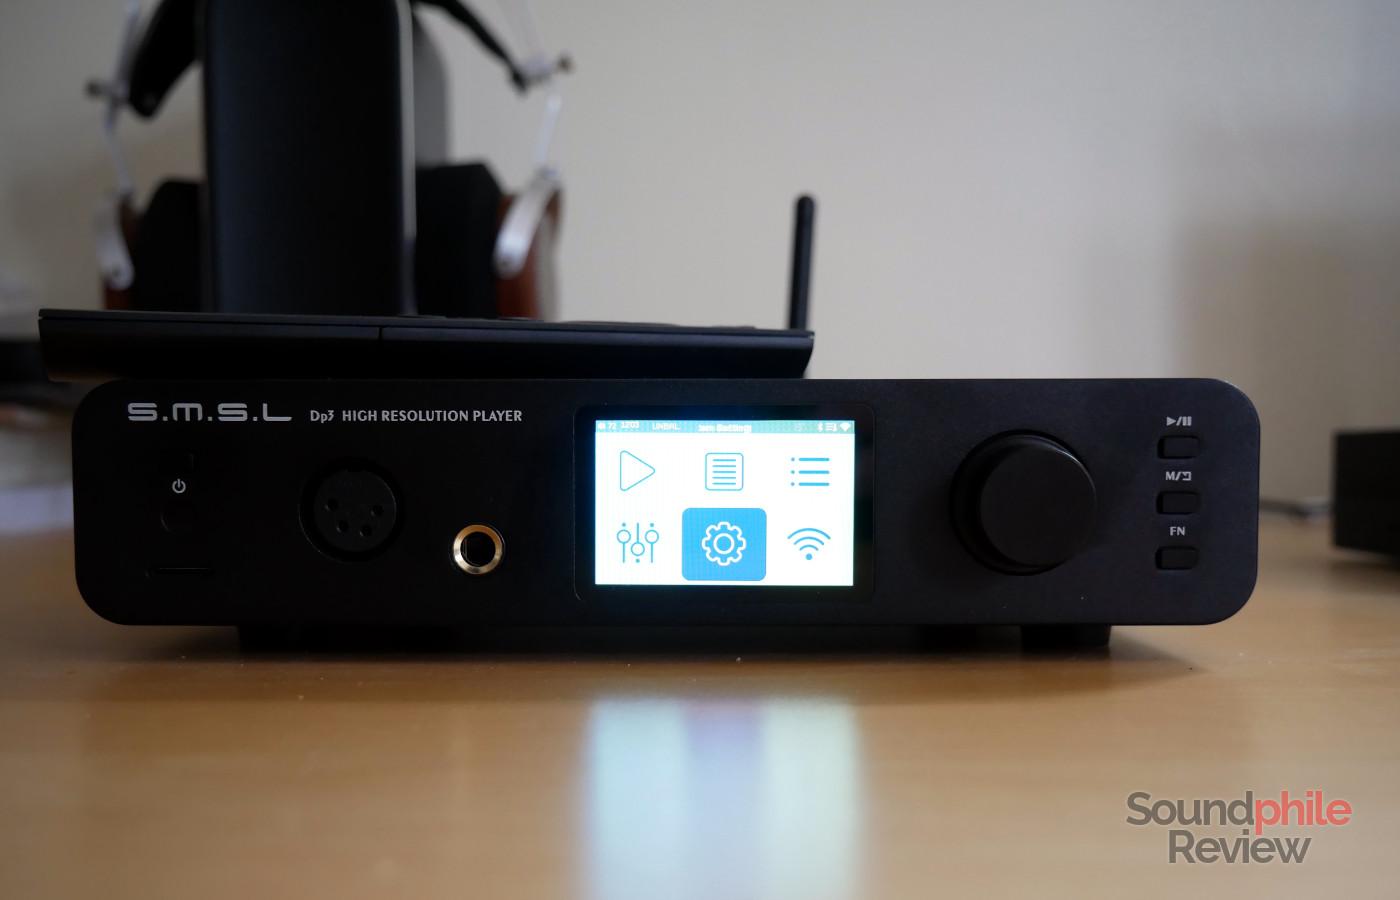 SMSL DP3 review: a player for your desktop - Soundphile Review